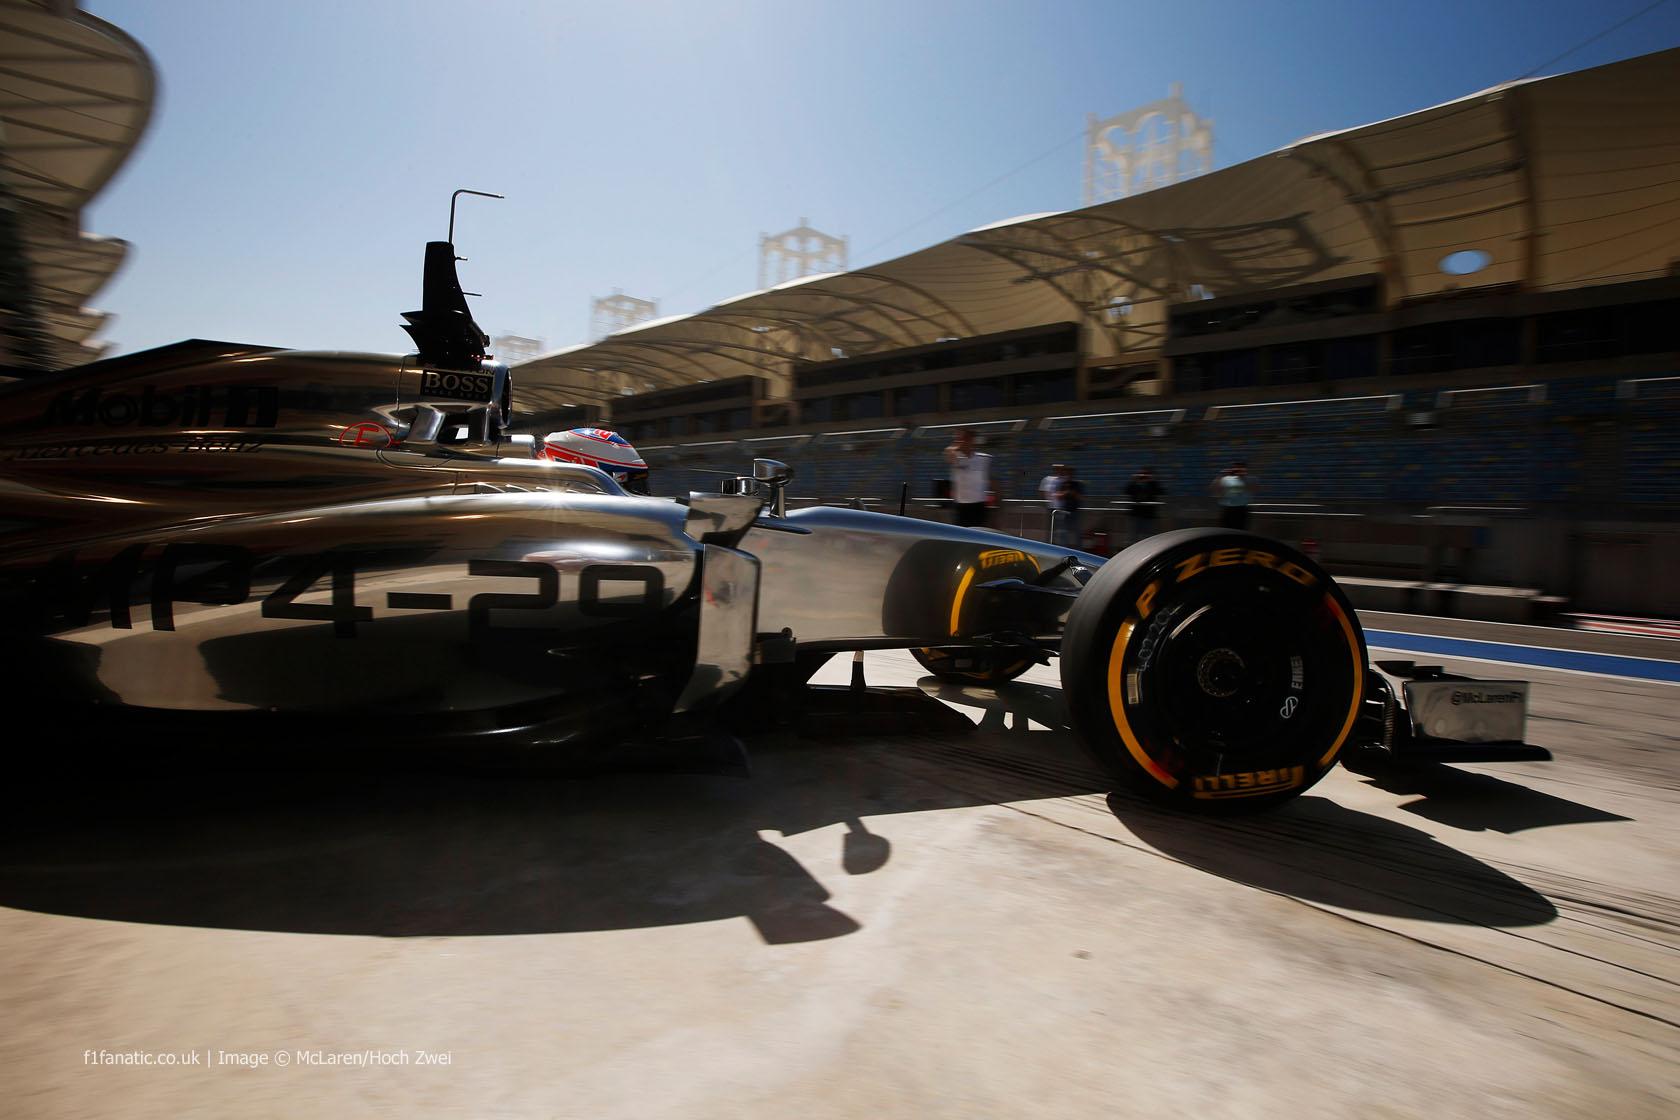 Jenson Button, McLaren, Bahrain, 2014